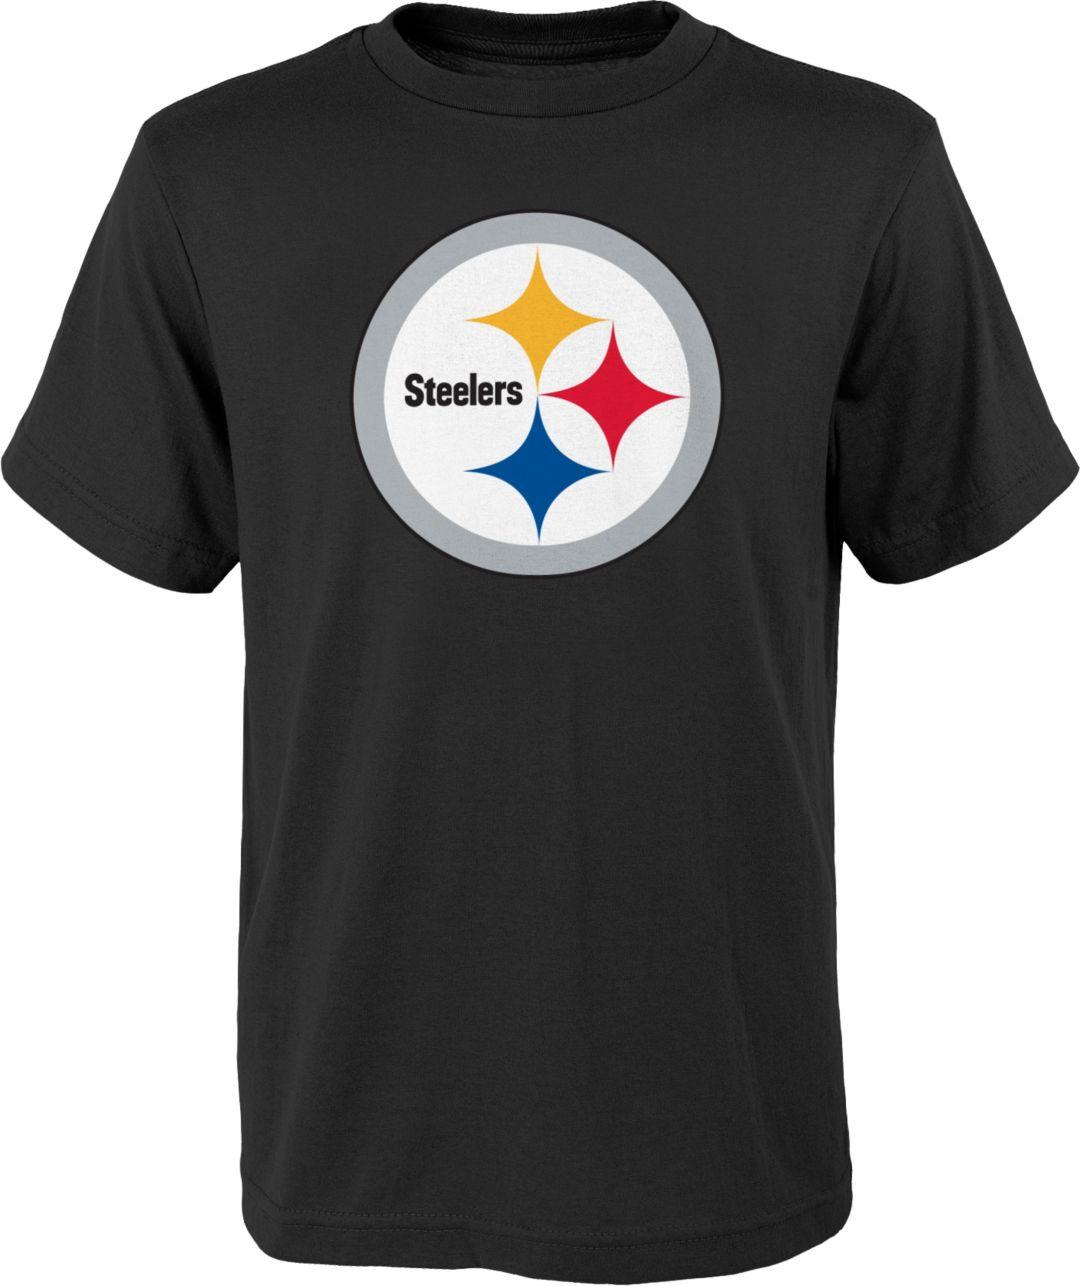 e3e477c8edaa43 NFL Team Apparel Youth Pittsburgh Steelers Logo Black T-Shirt.  noImageFound. Previous